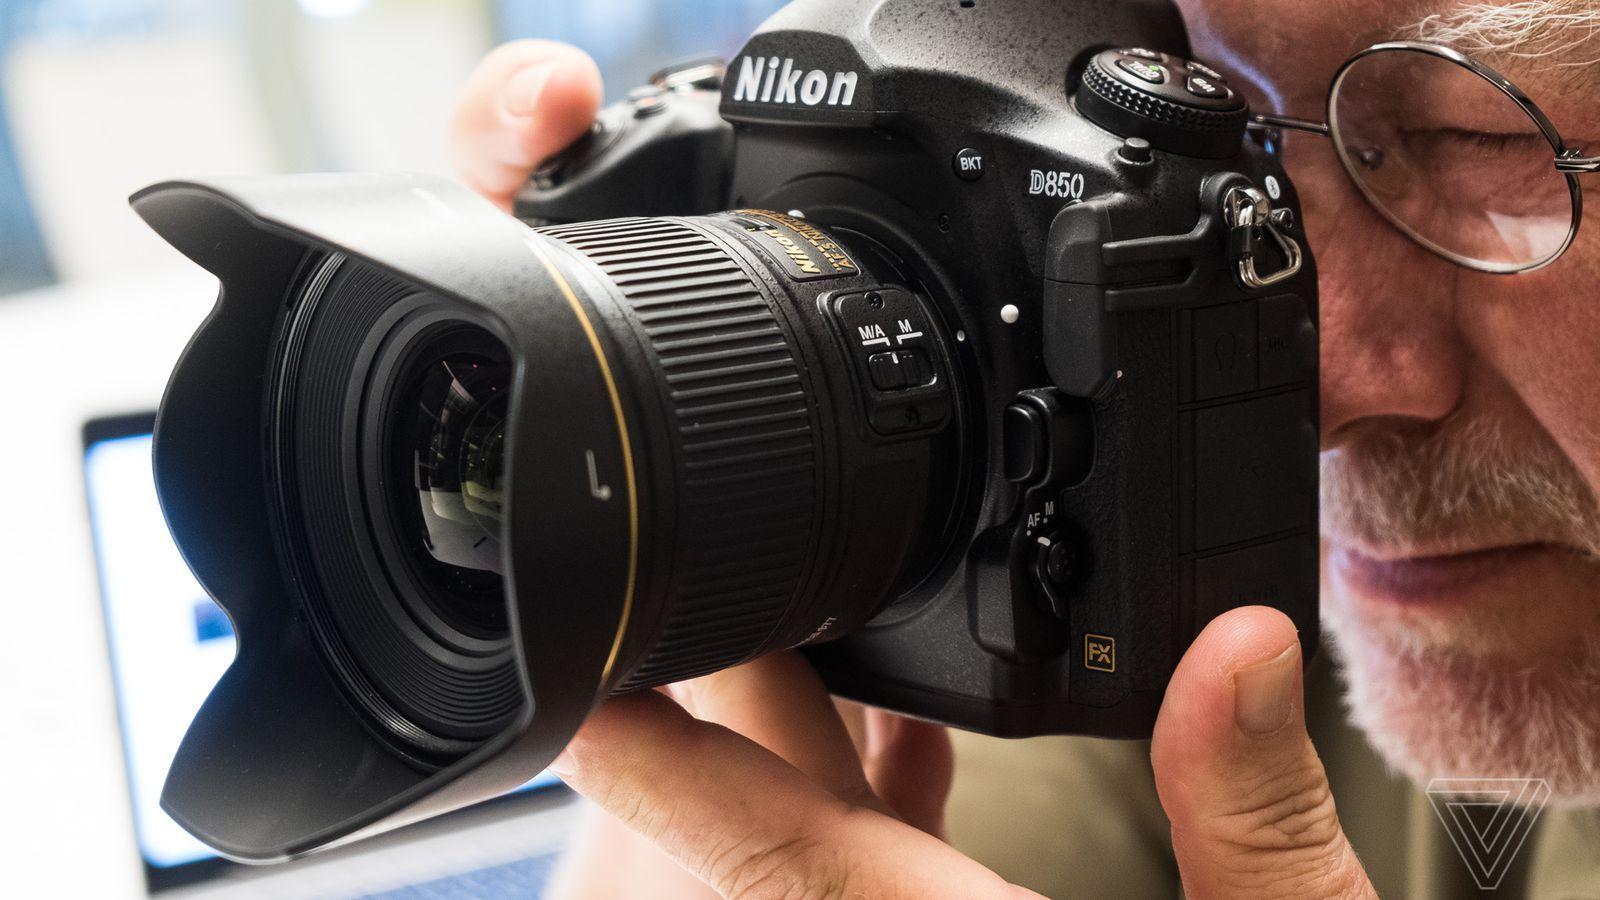 Nikon\'s new D850 has 45.7 megapixels and enough features to tempt ...